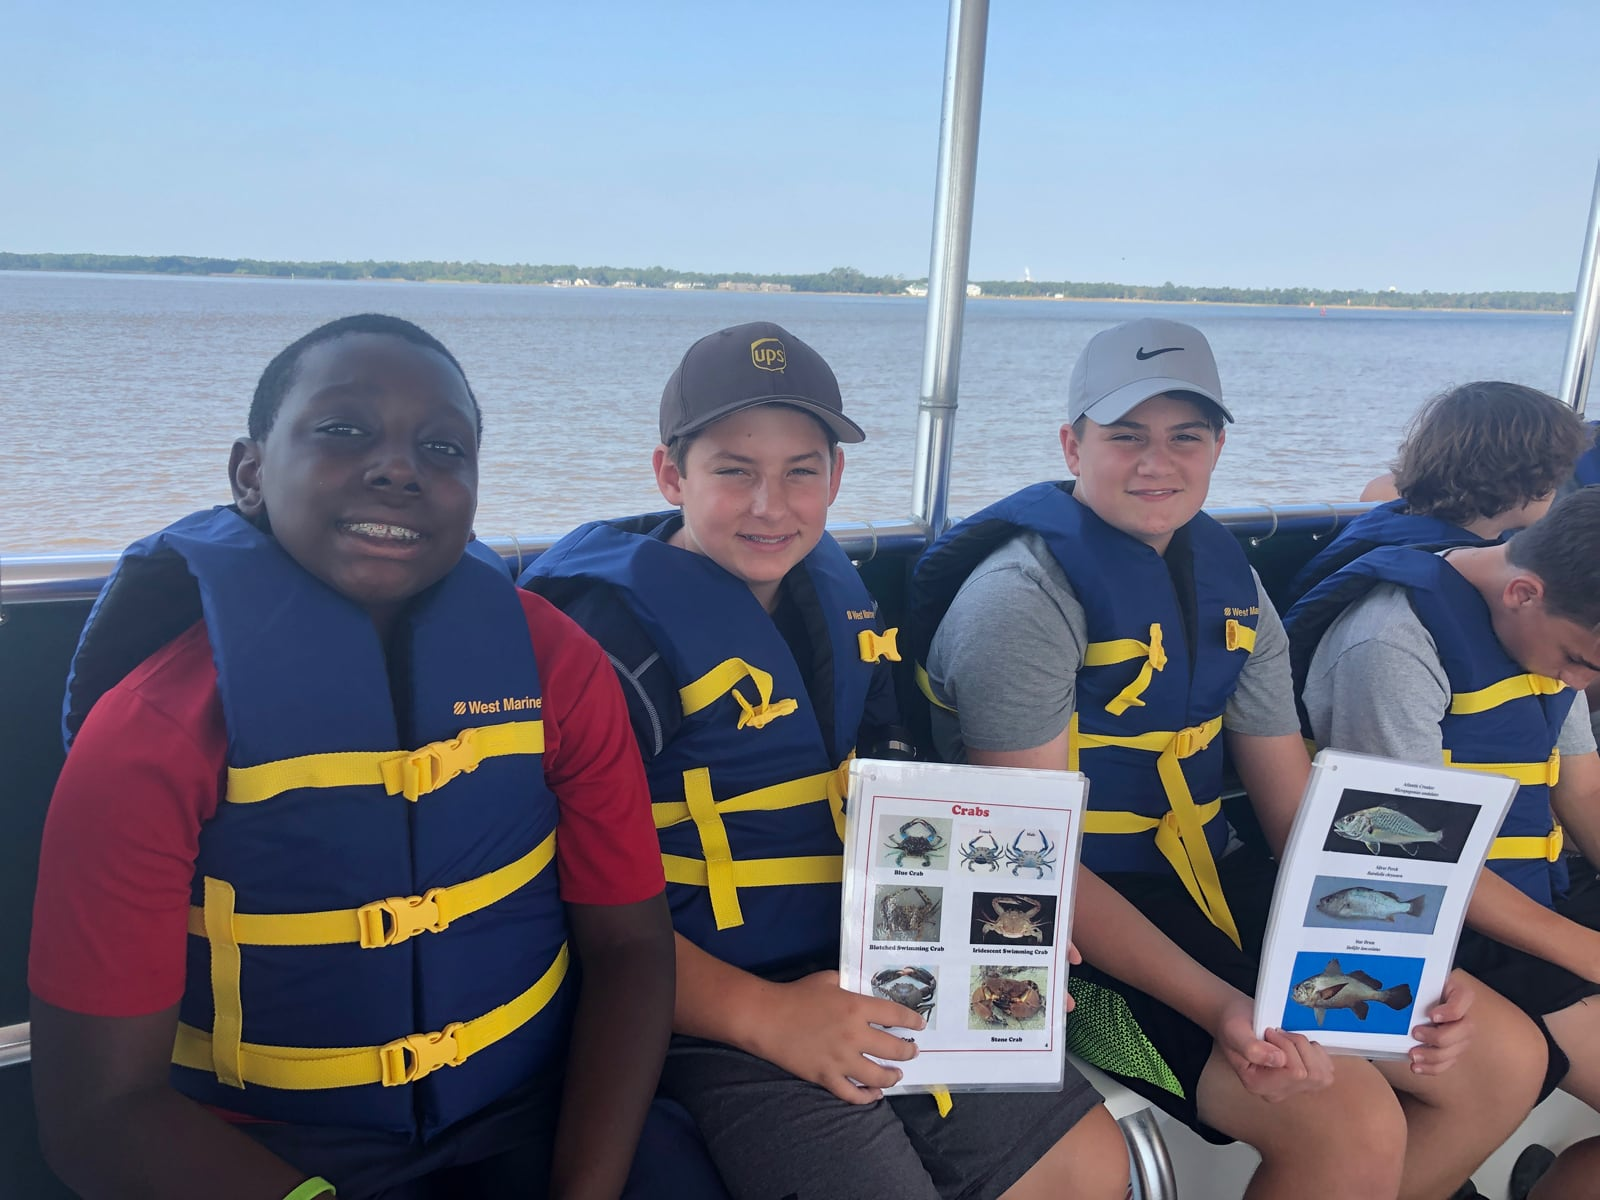 Middle school boys exploring Winyah Bay by boat